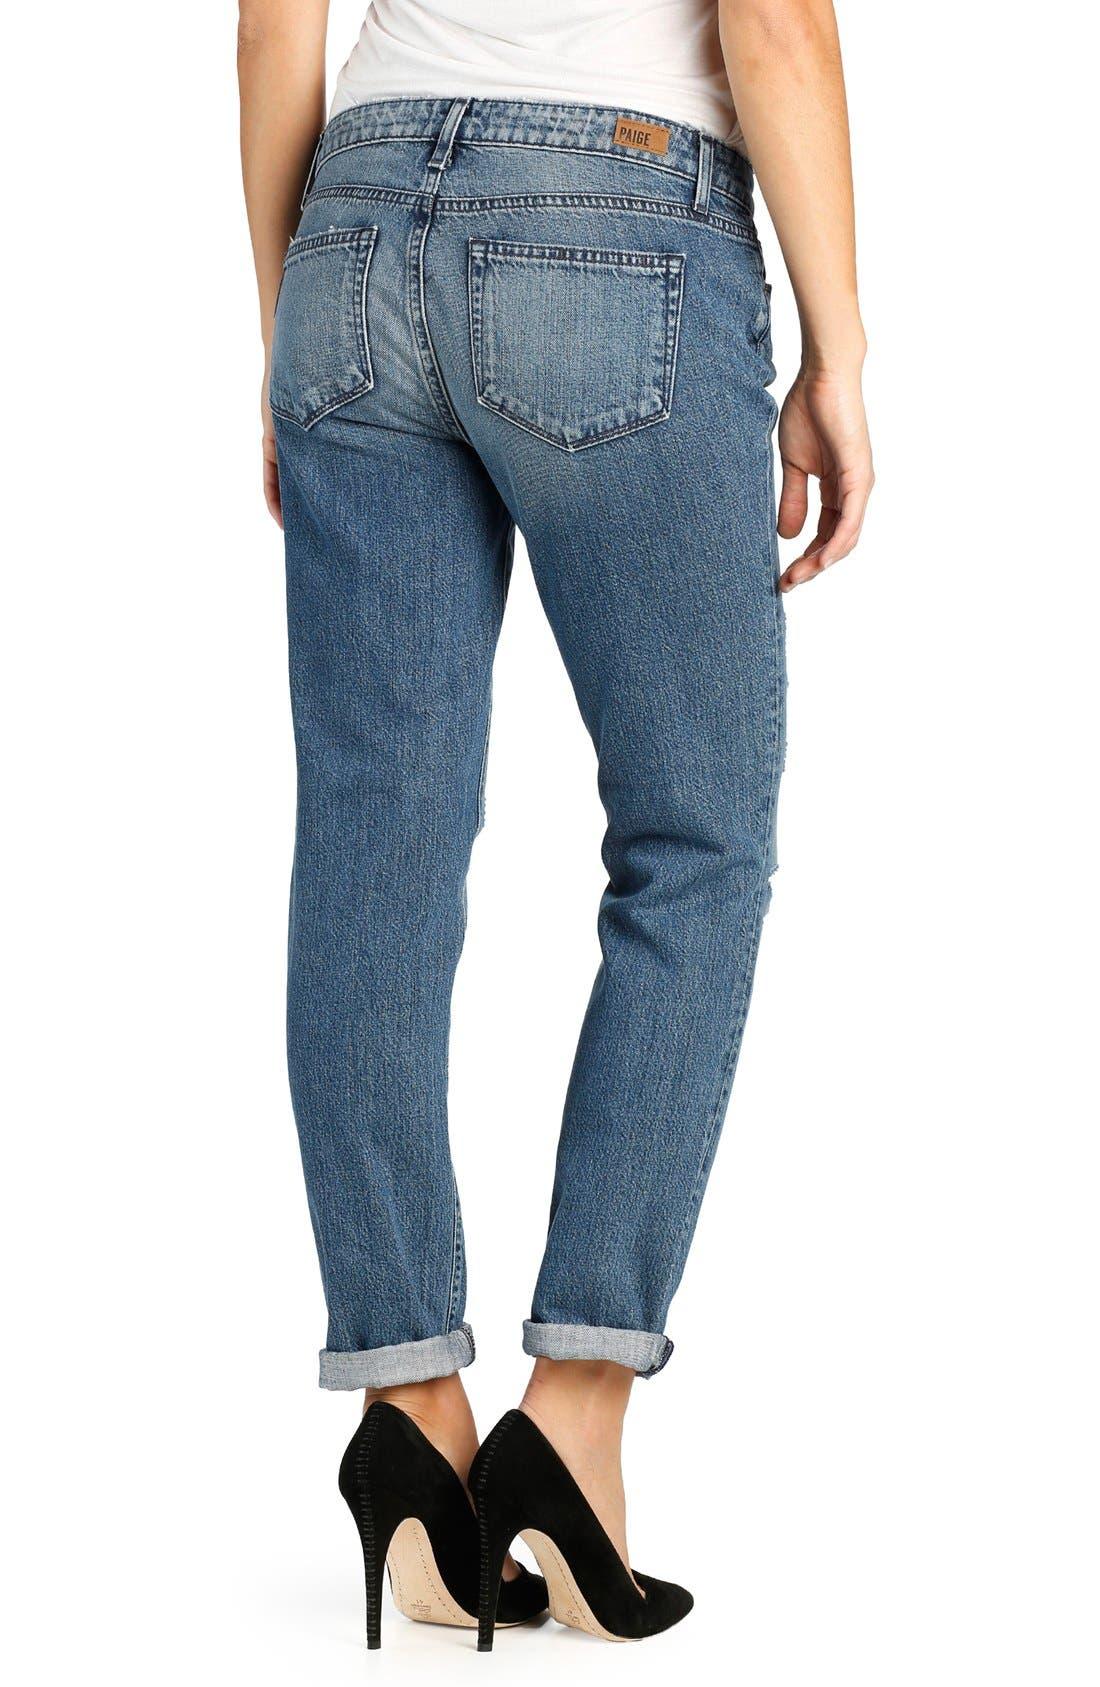 Alternate Image 2  - PAIGE 'Jimmy Jimmy' Destroyed Skinny Jeans (Westley Destructed)